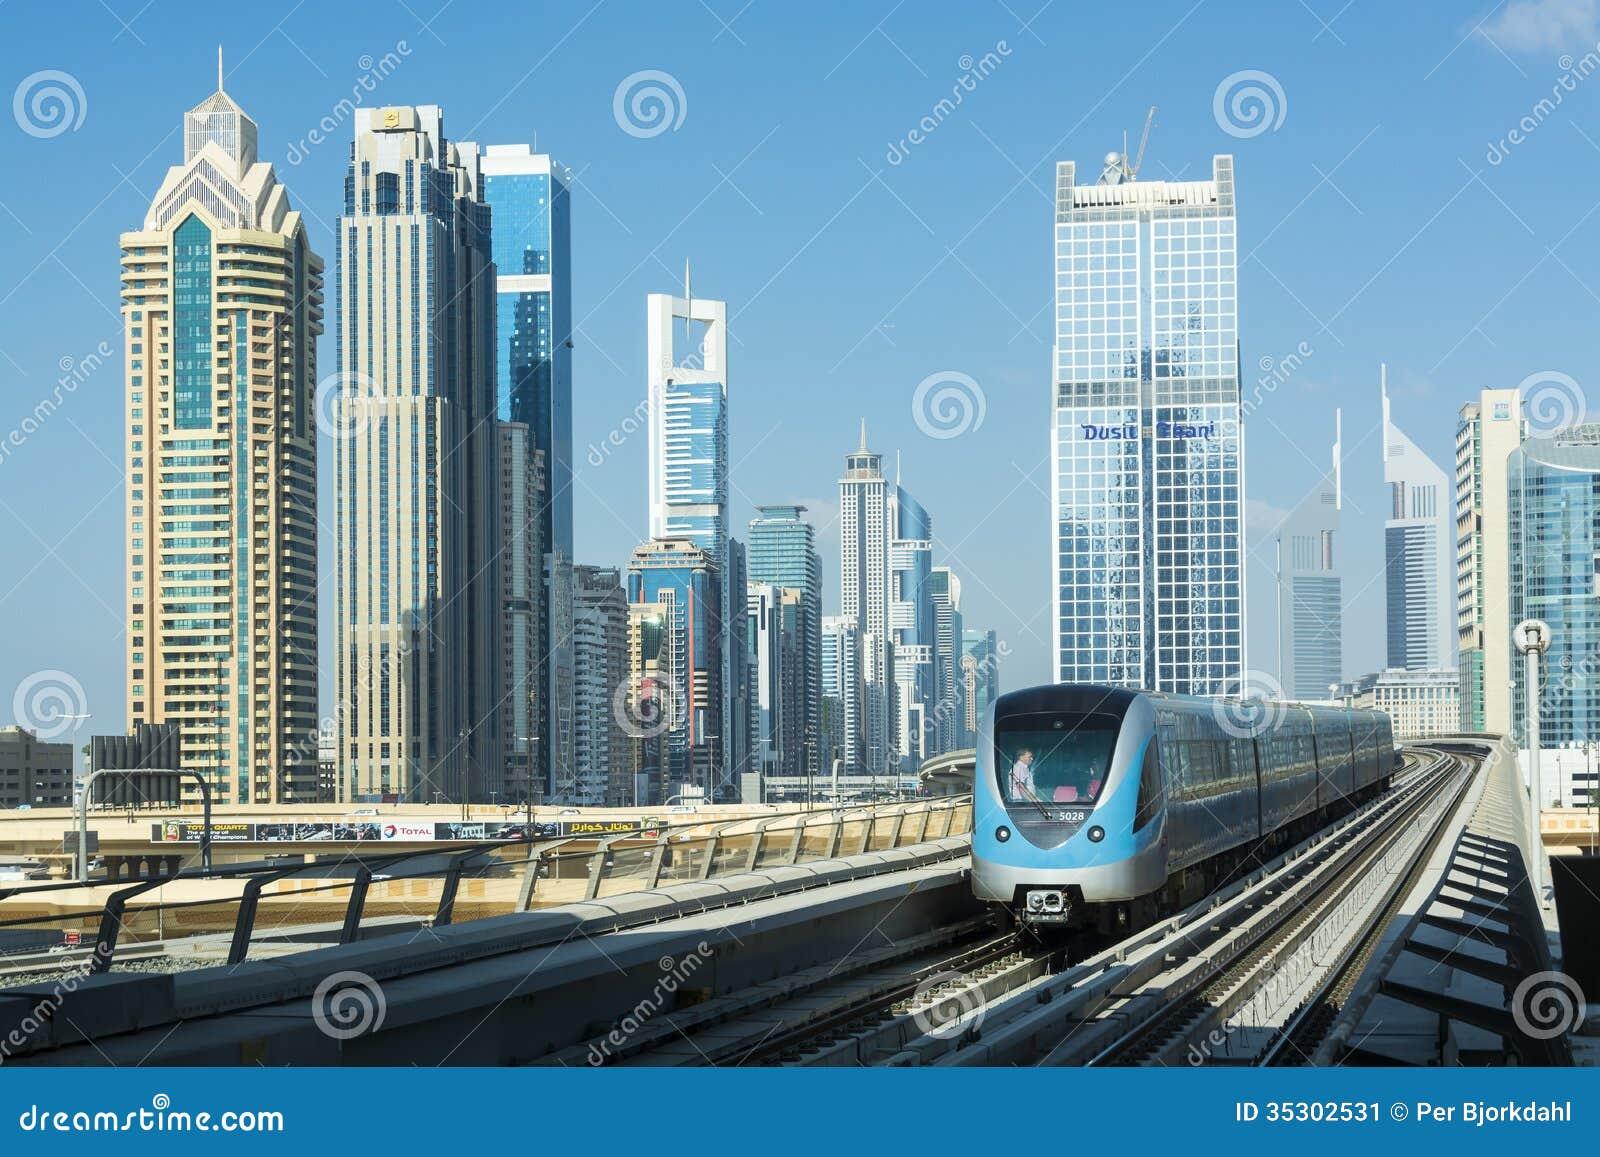 Dubai tunnelbana